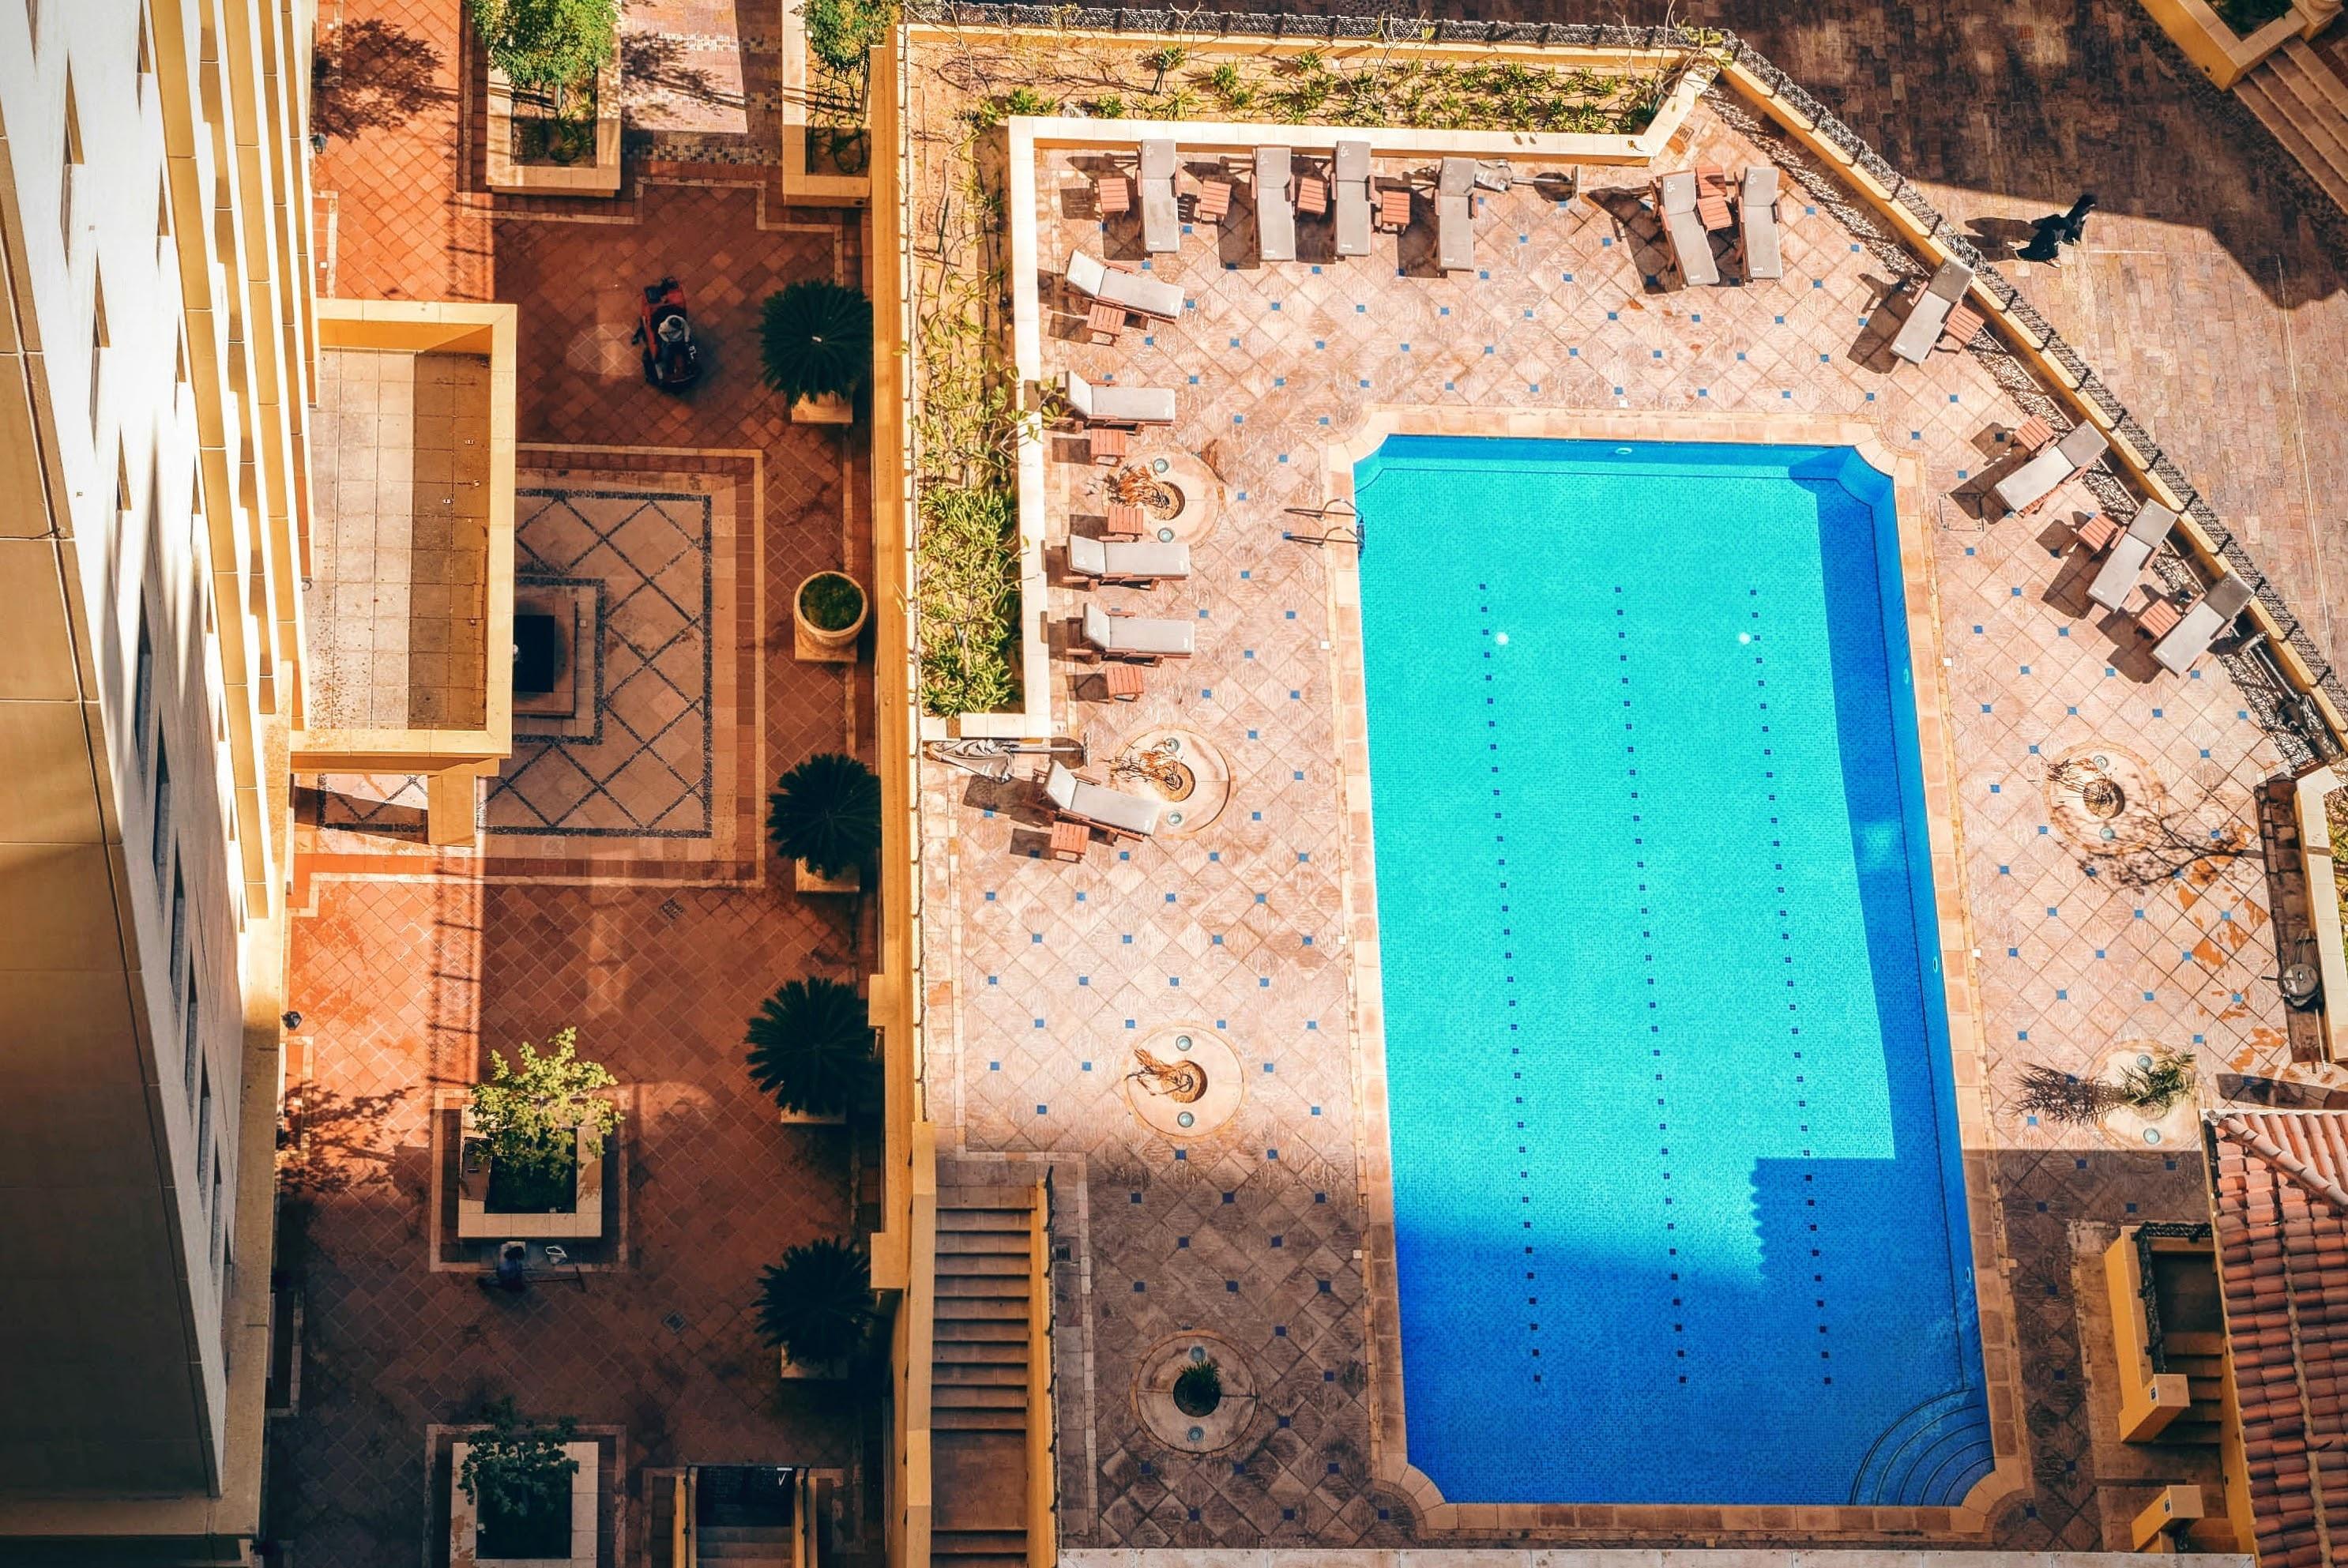 Pool, Blue, Building, Construction, Swim, HQ Photo